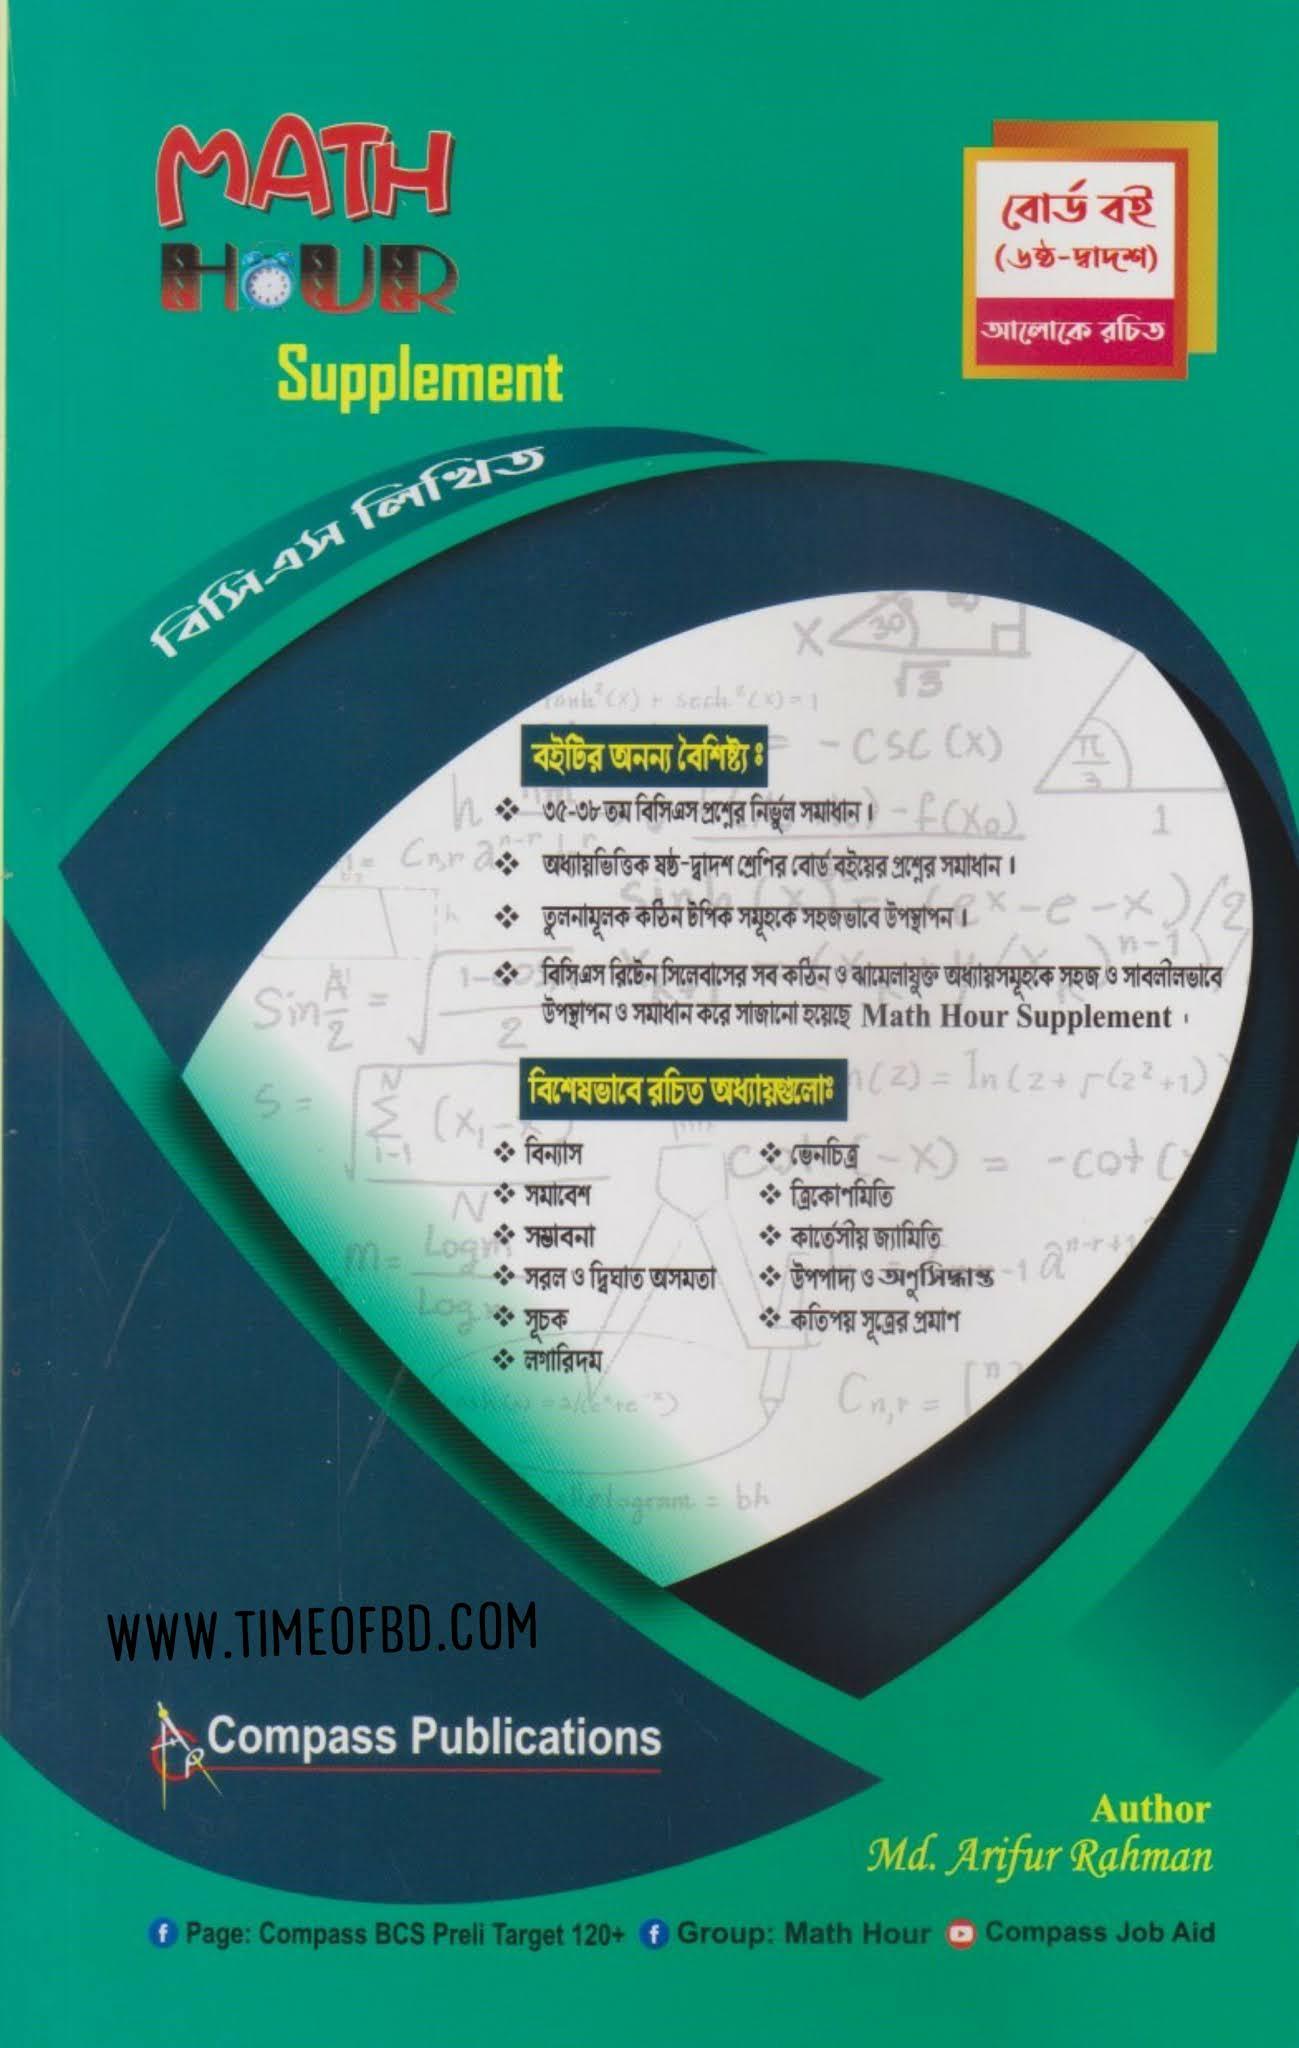 Math hour book pdf download link, Math hour book pdf download,Math hour book pdf,Math hour book